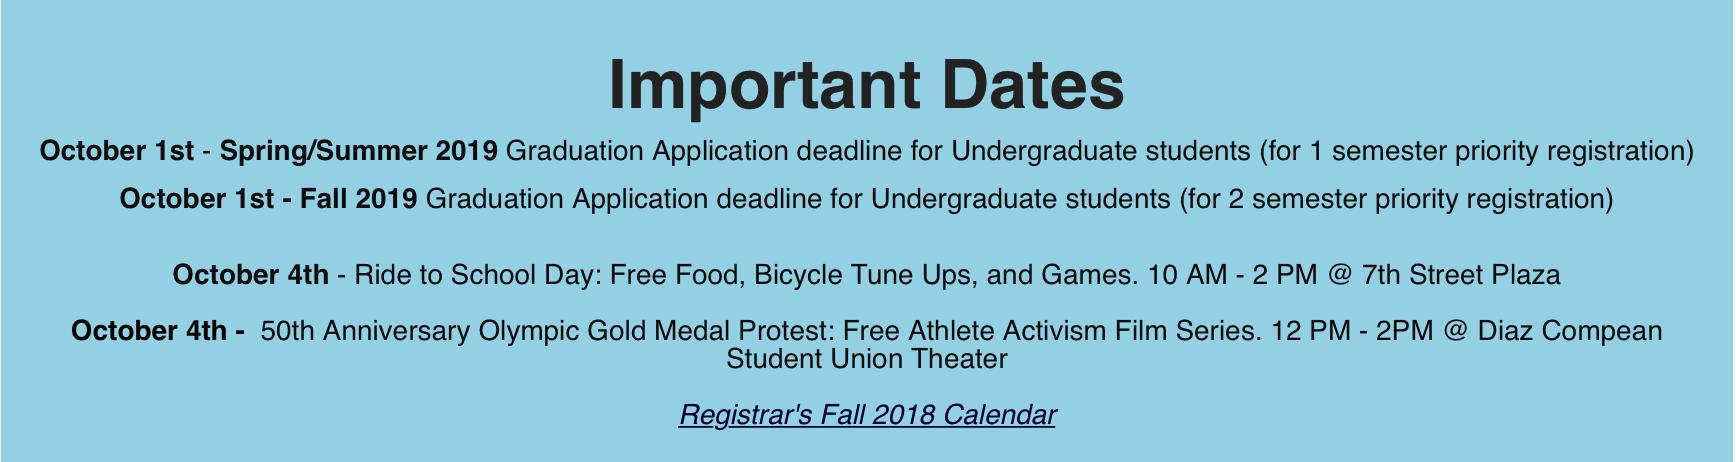 sjsu academic calendar fall 2019